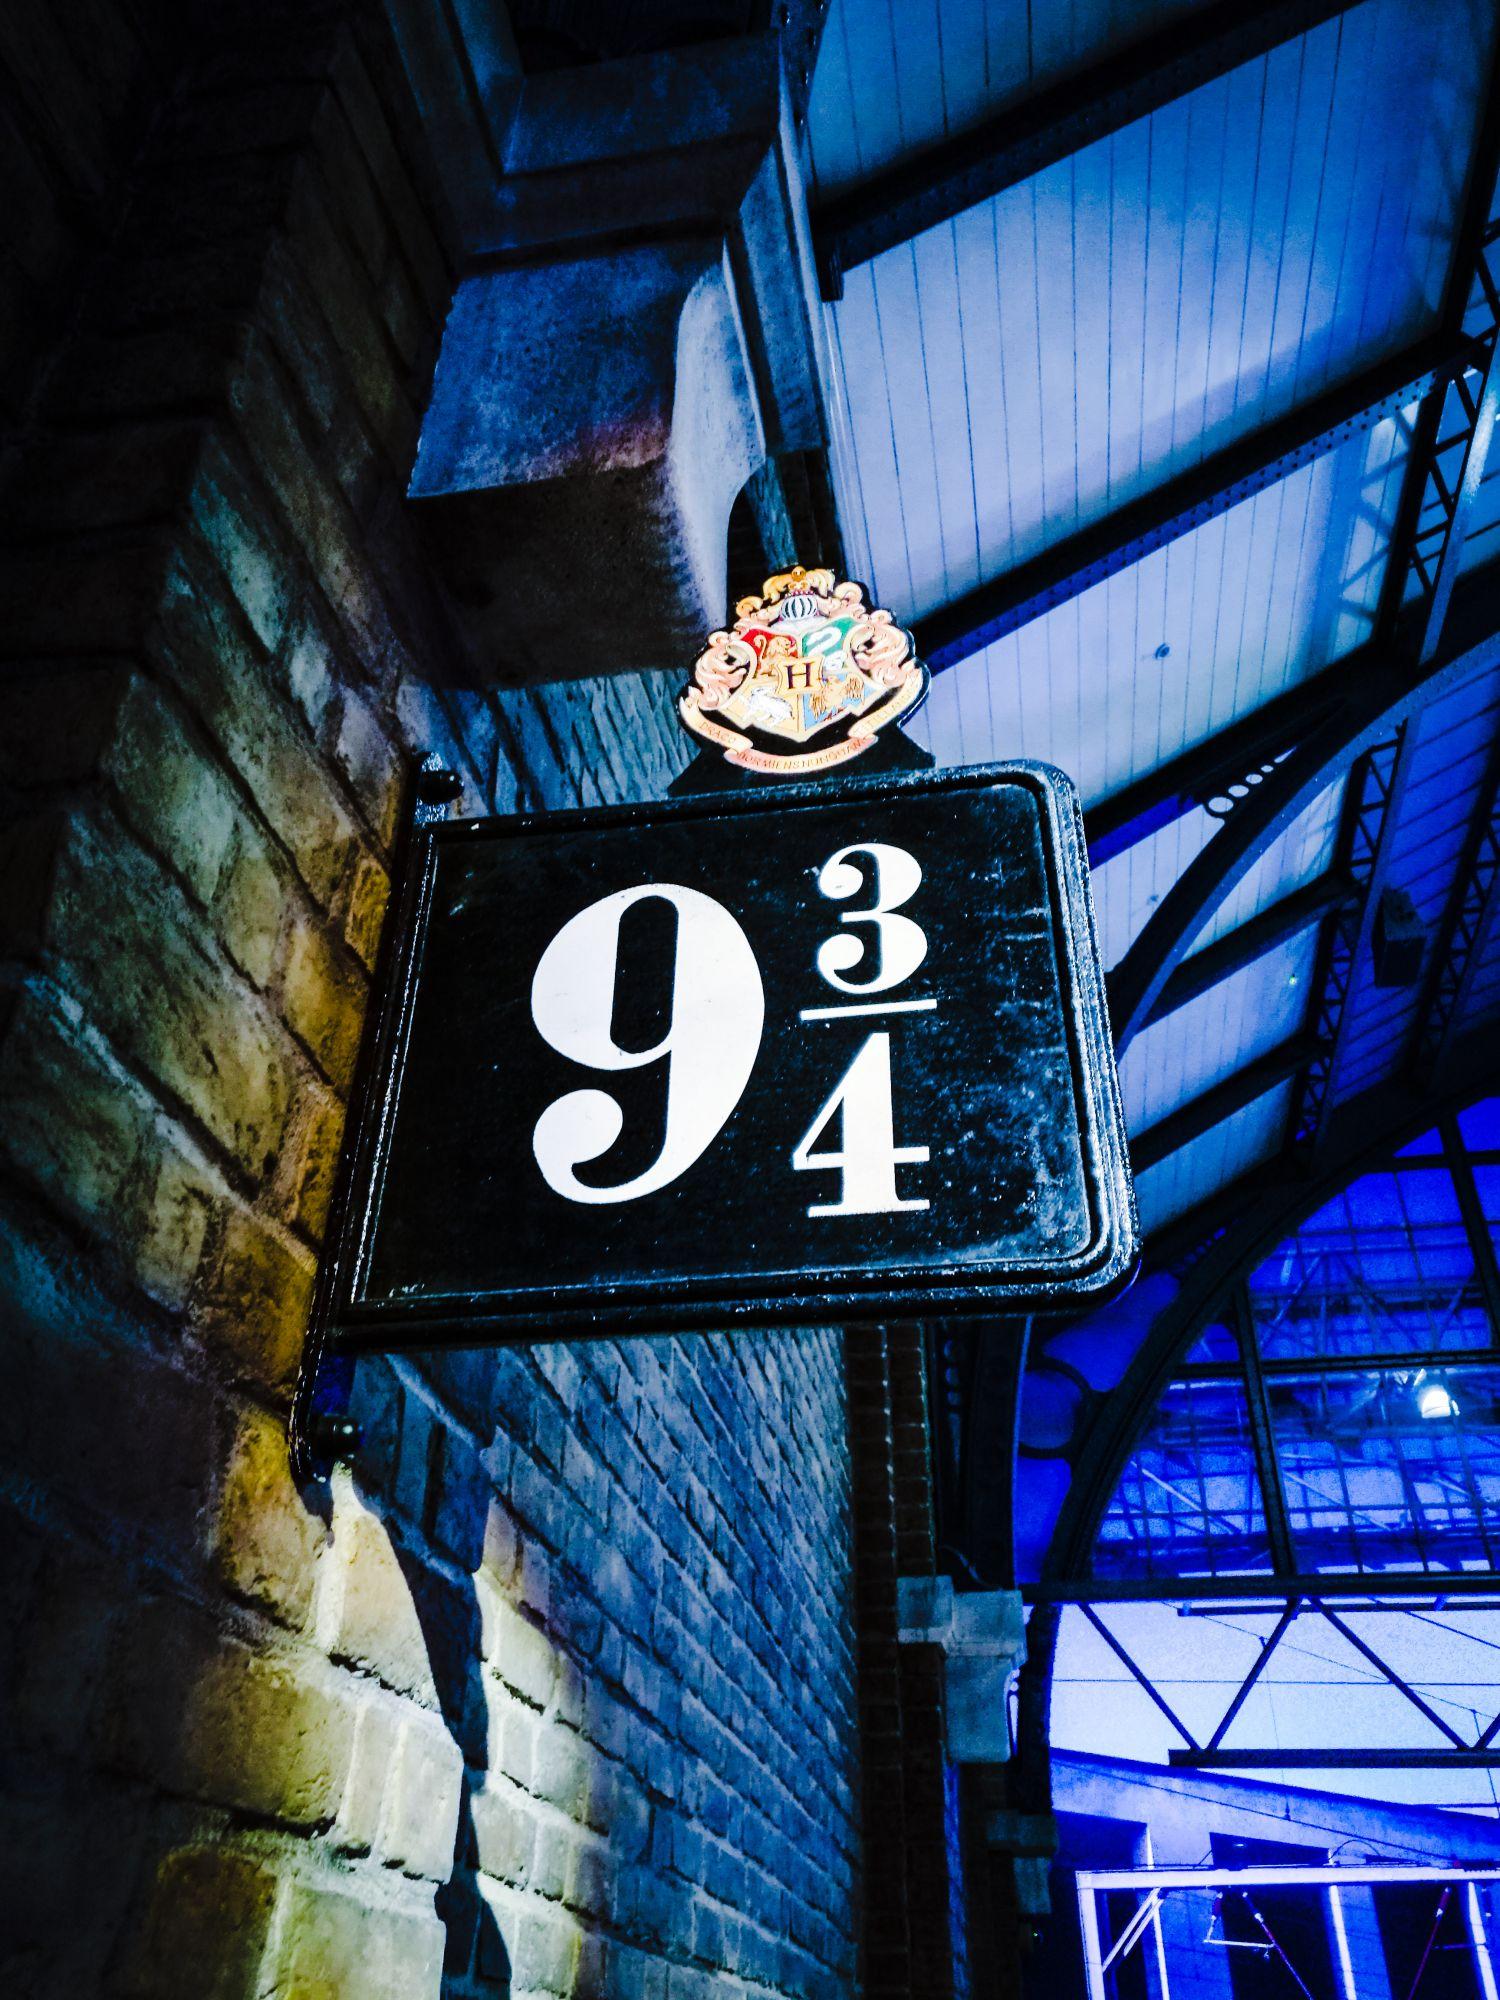 Voie 9, gare de King's Cross, Londres - Studios Harry Potter  Londres